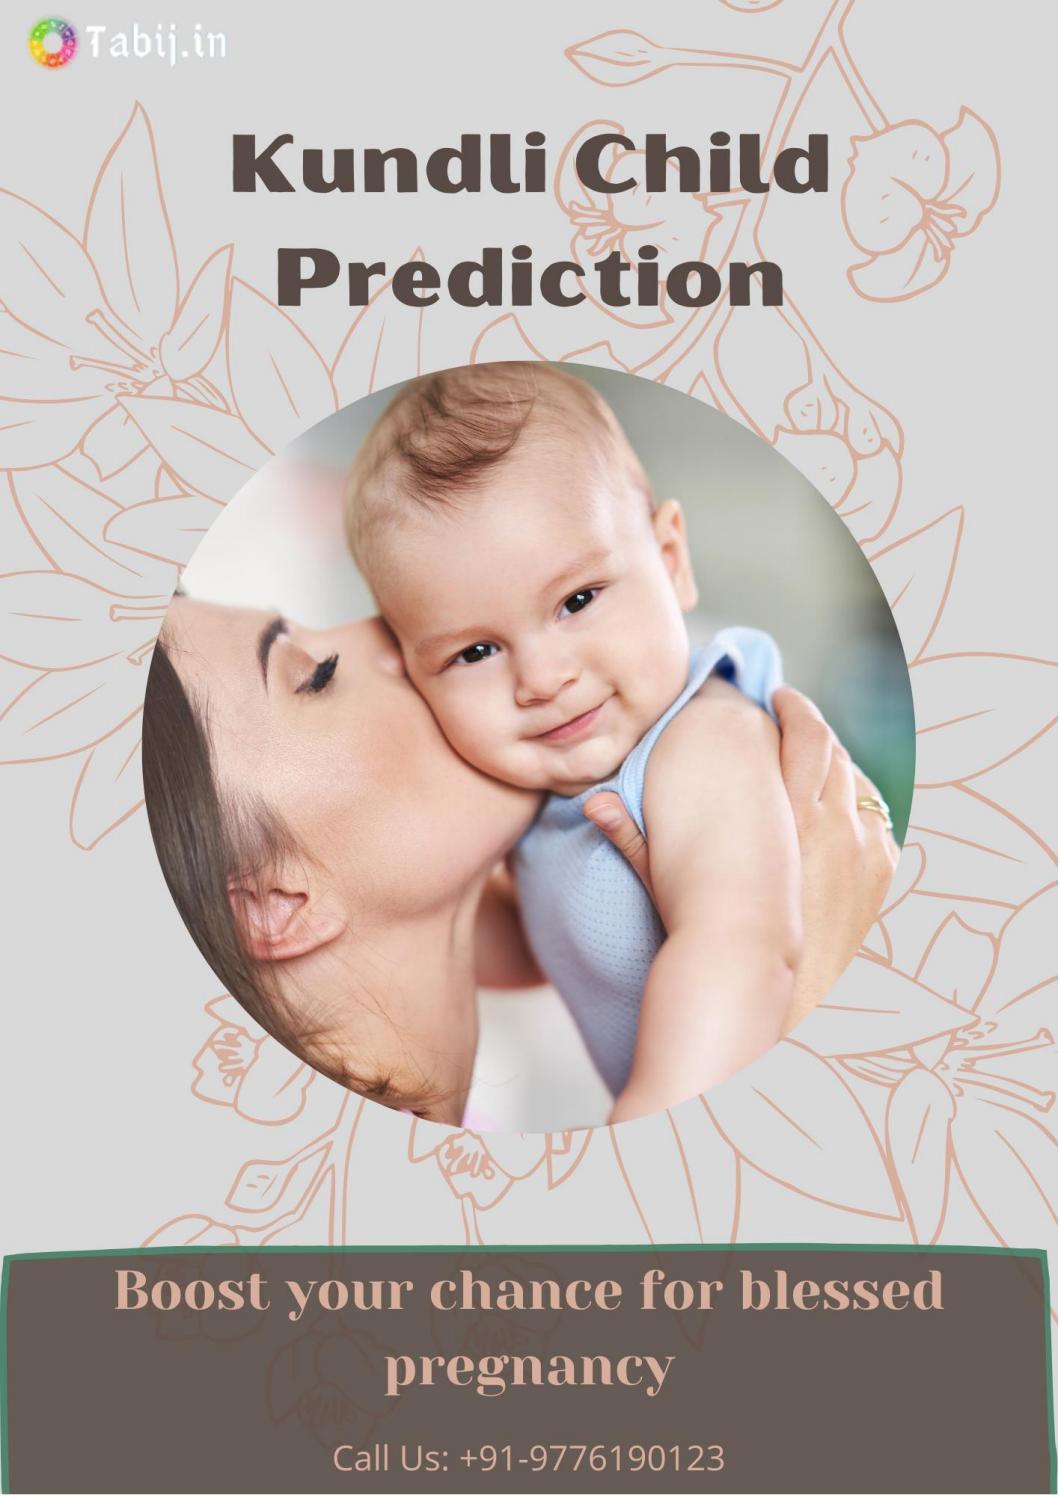 Get Kundali Of New Born Baby : kundali, Boost, Chance, Blessed, Pregnancy, Kundli, Child, Prediction, Sofiaastrology, Issuu